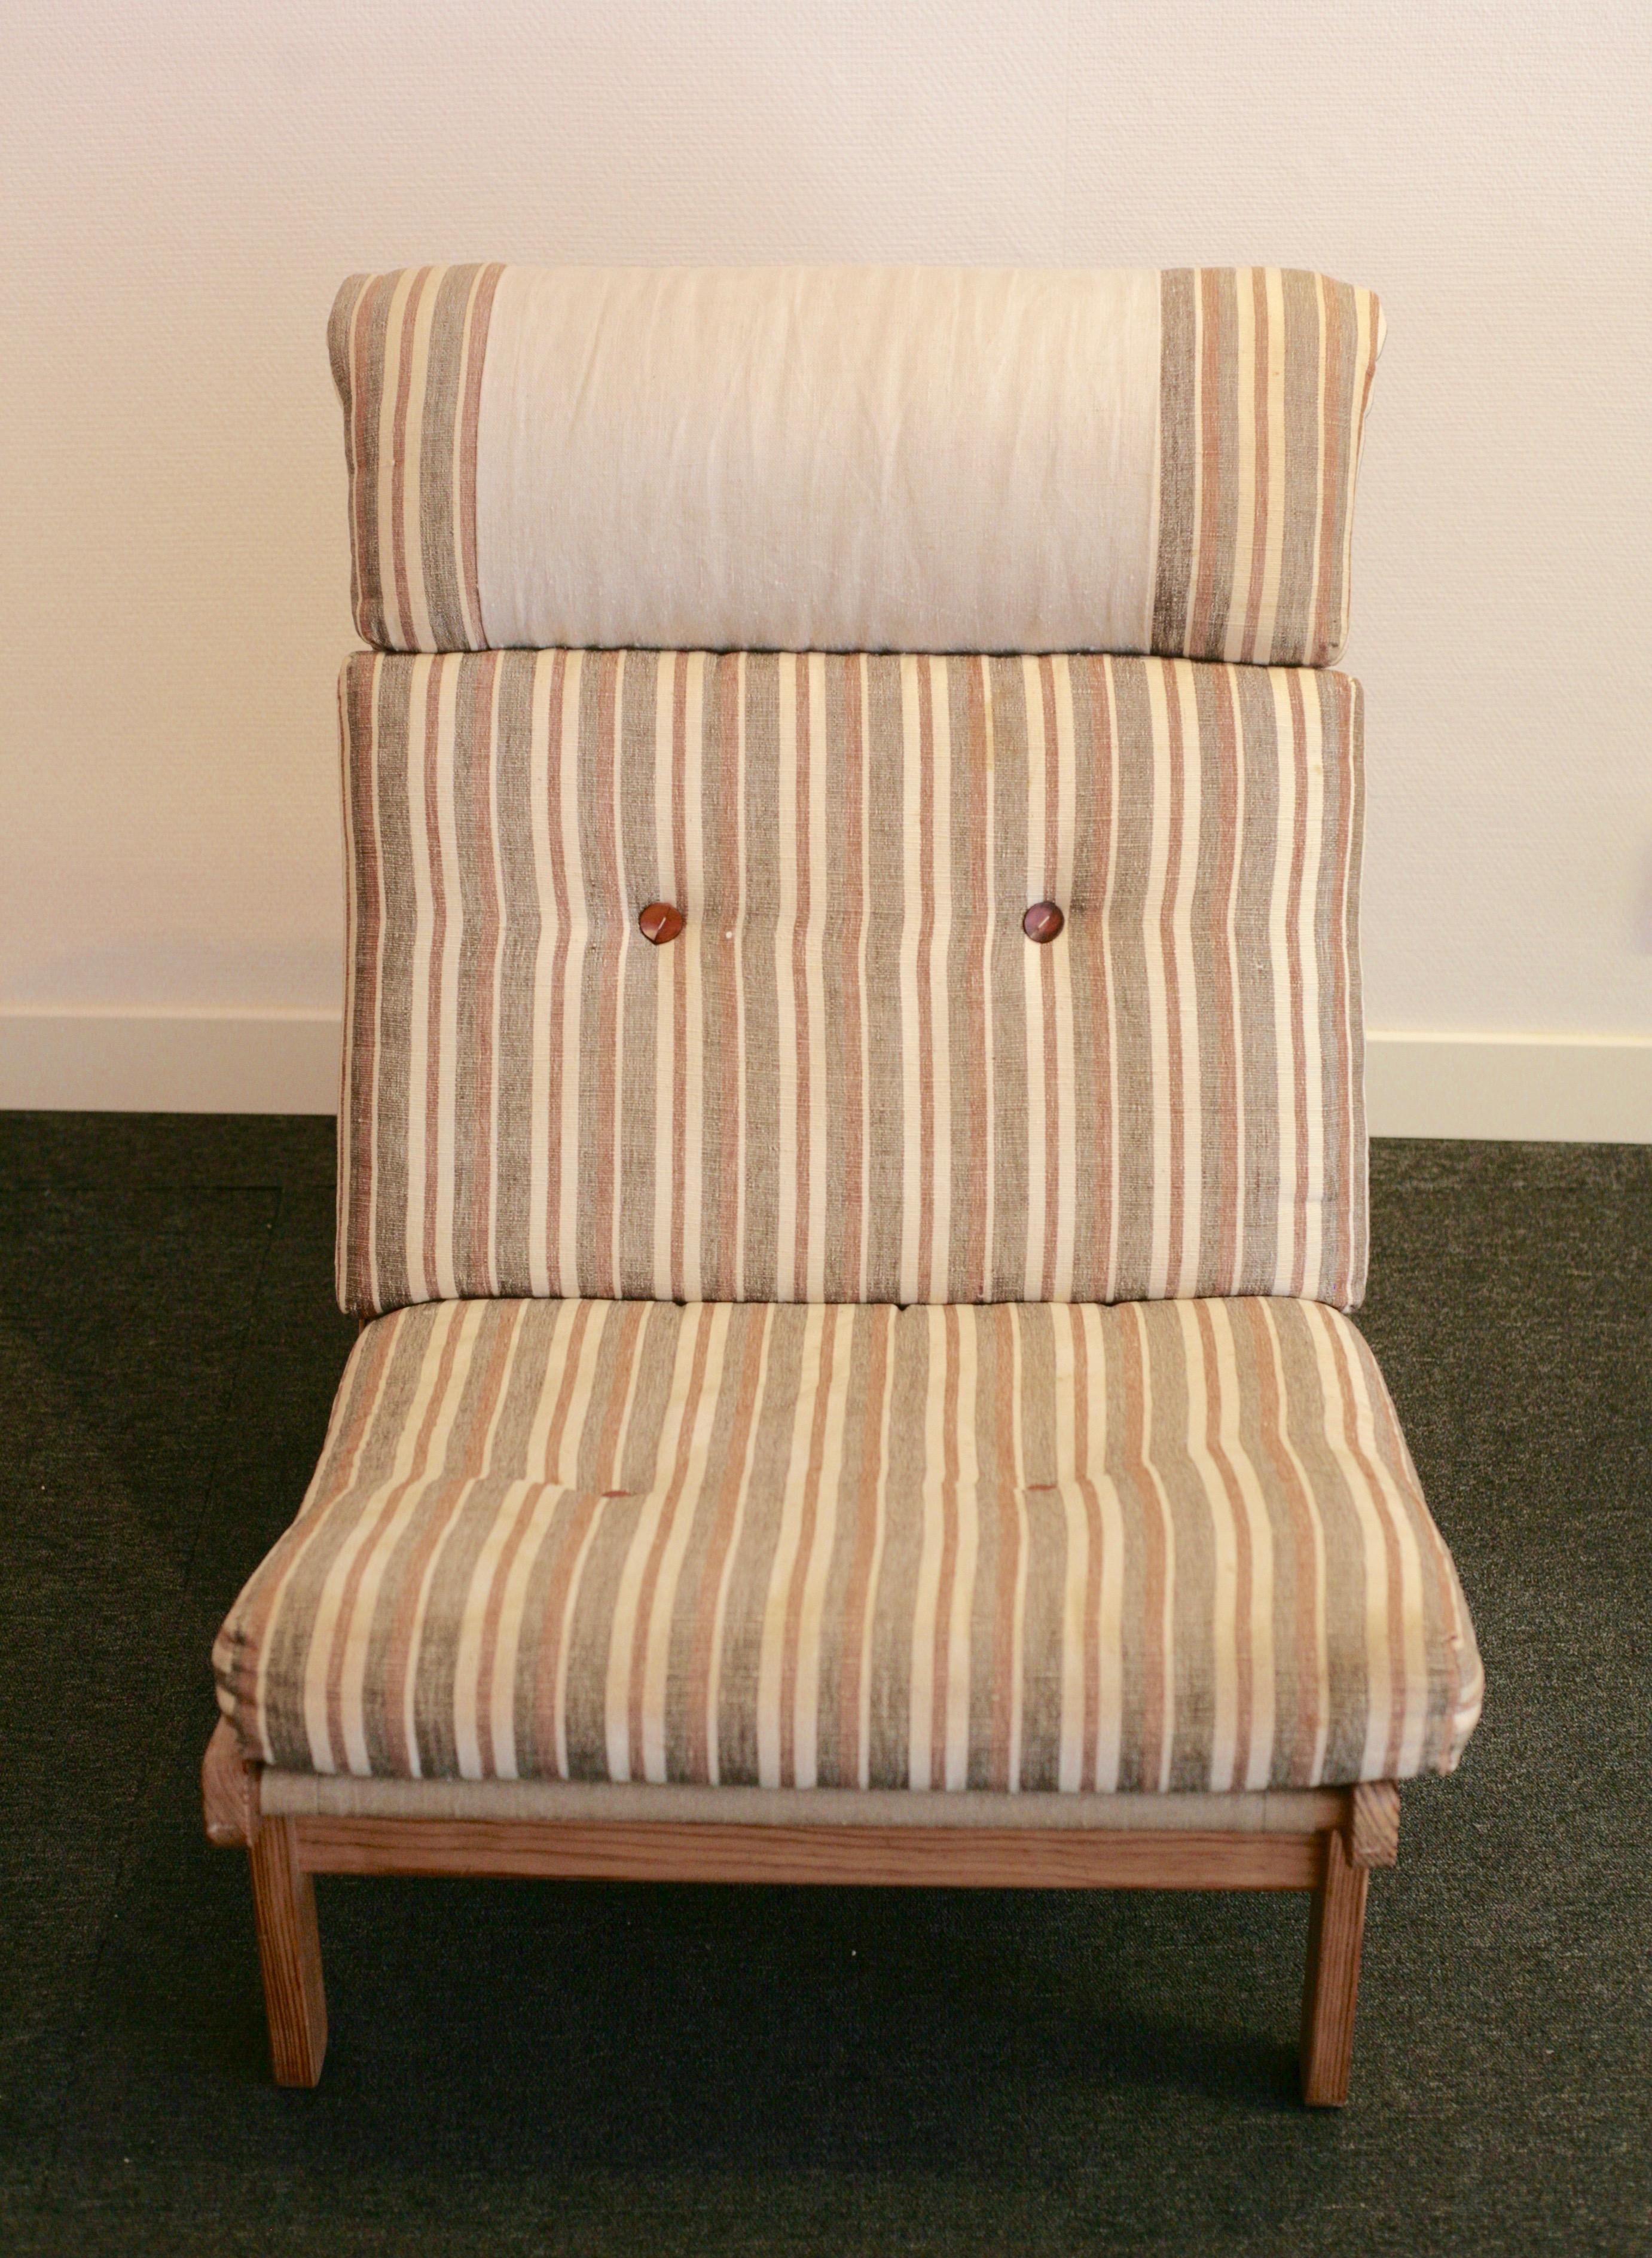 Rag chairs lounge set by Bernt Petersen